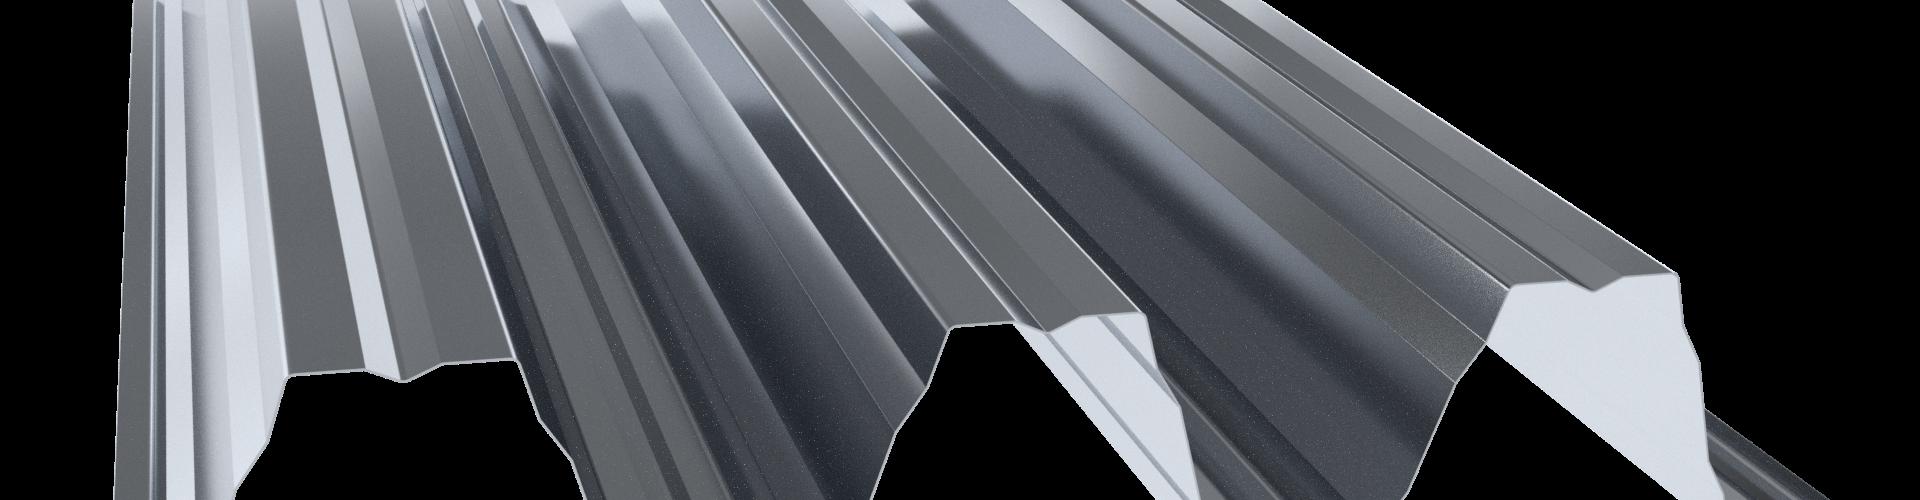 Konstruktionsprofil T155